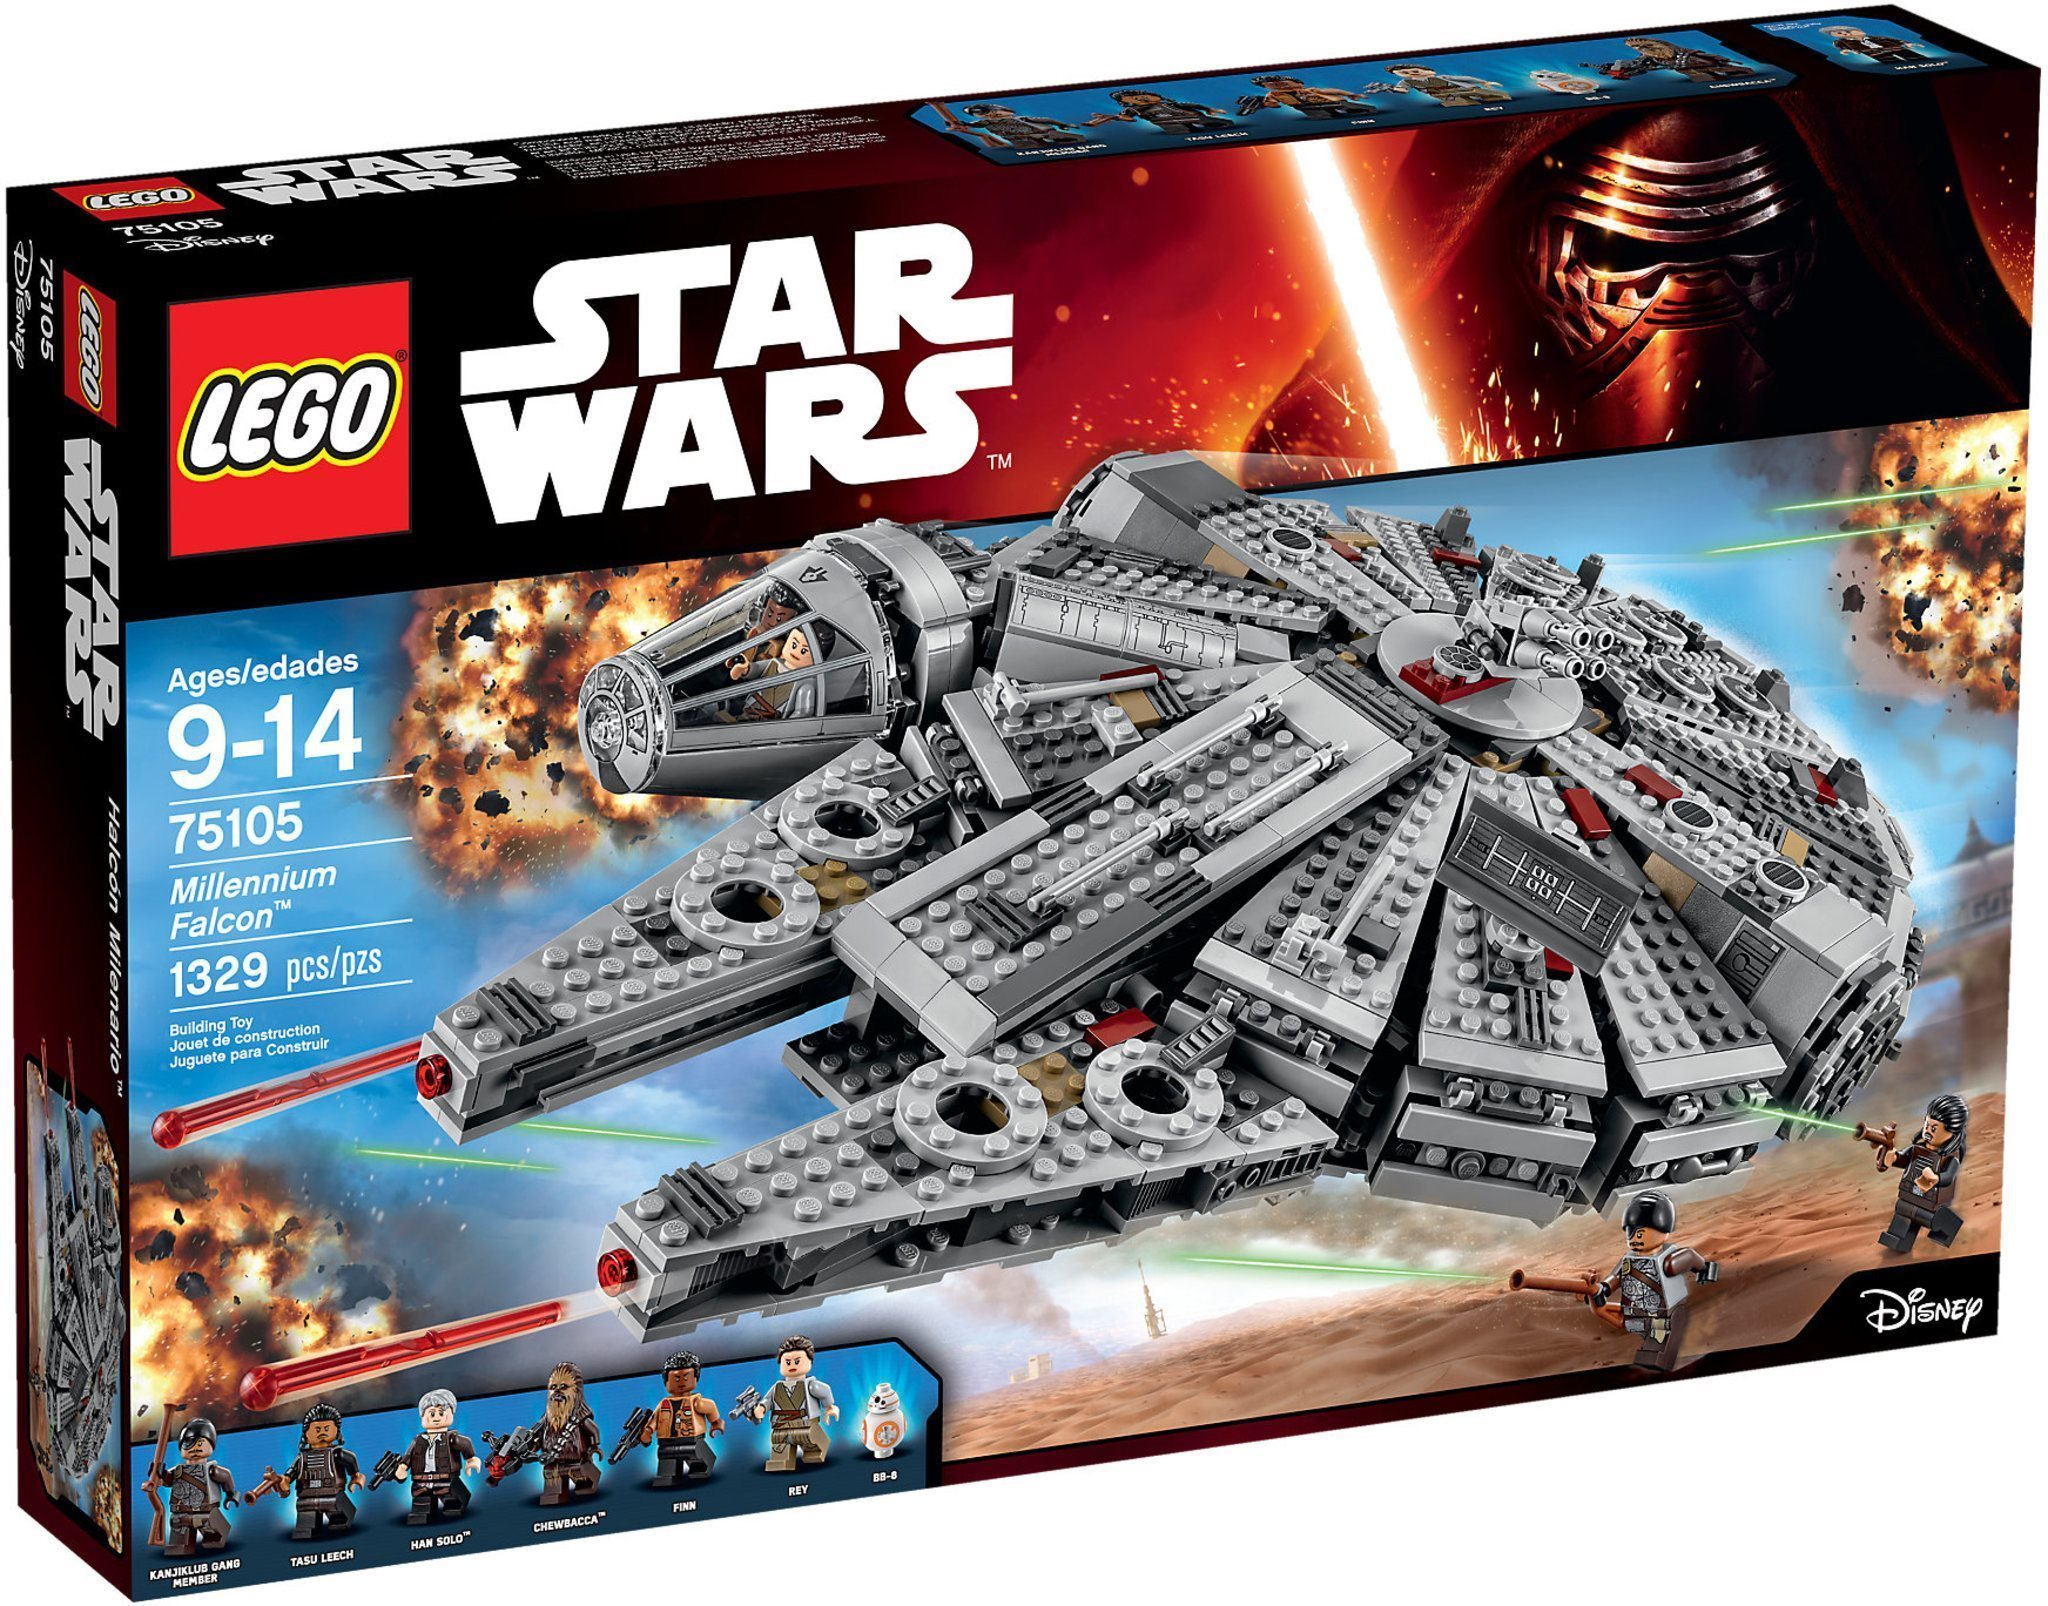 LEGO Star Wars 75105 Millennium Falcon - Ny